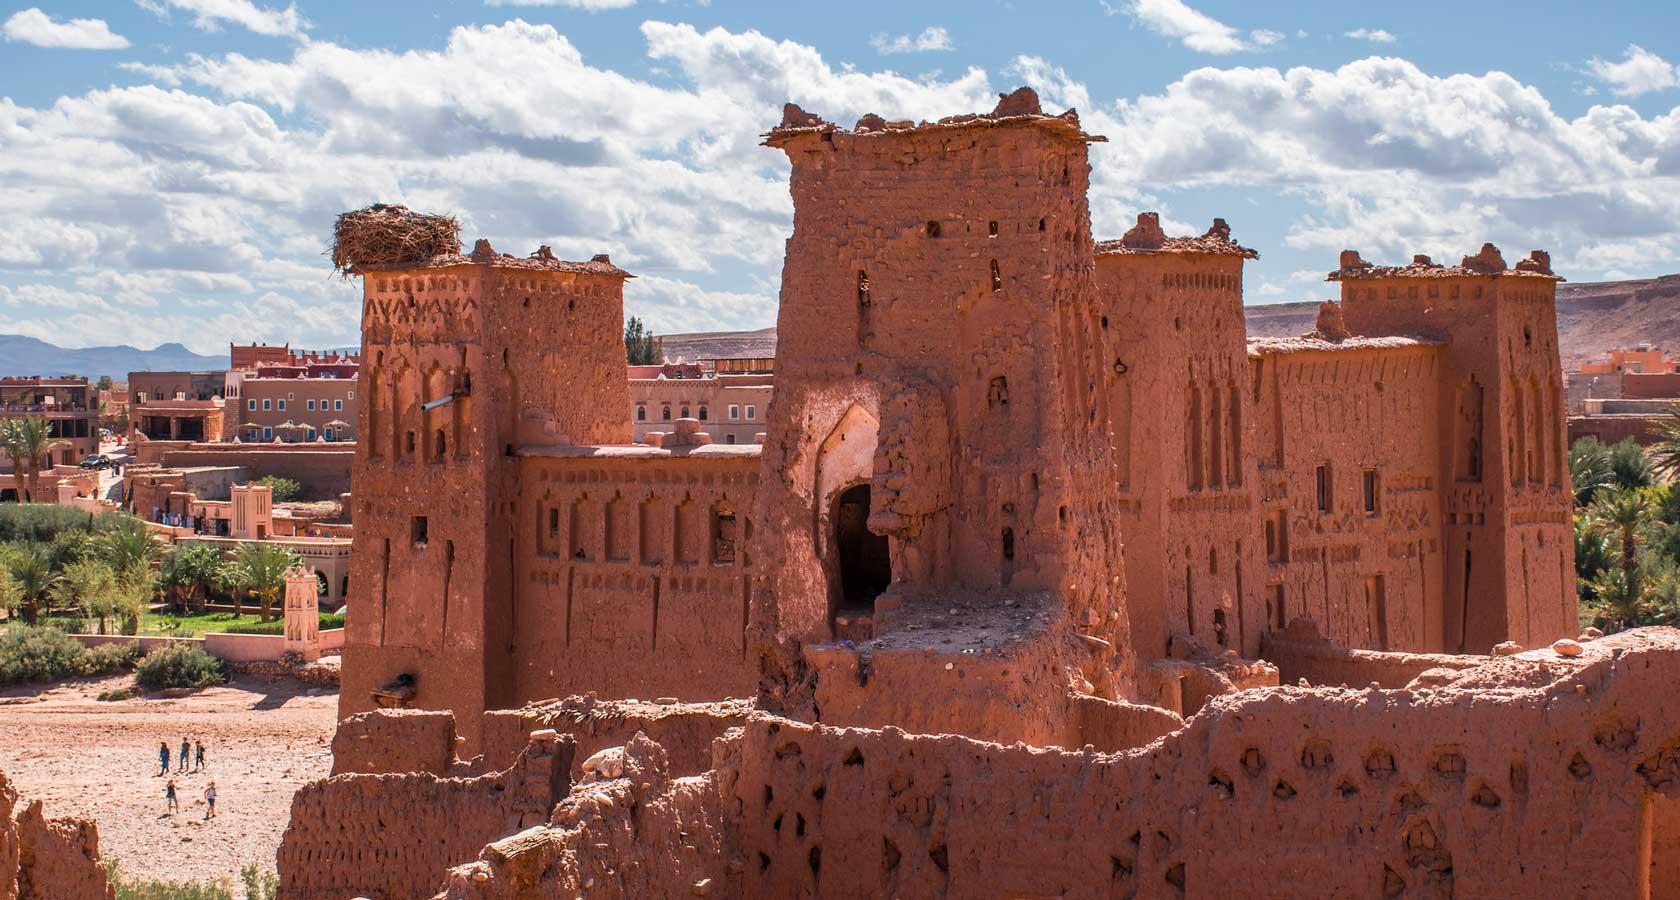 касба крепость ксар долина реки драа в пустыне марокко